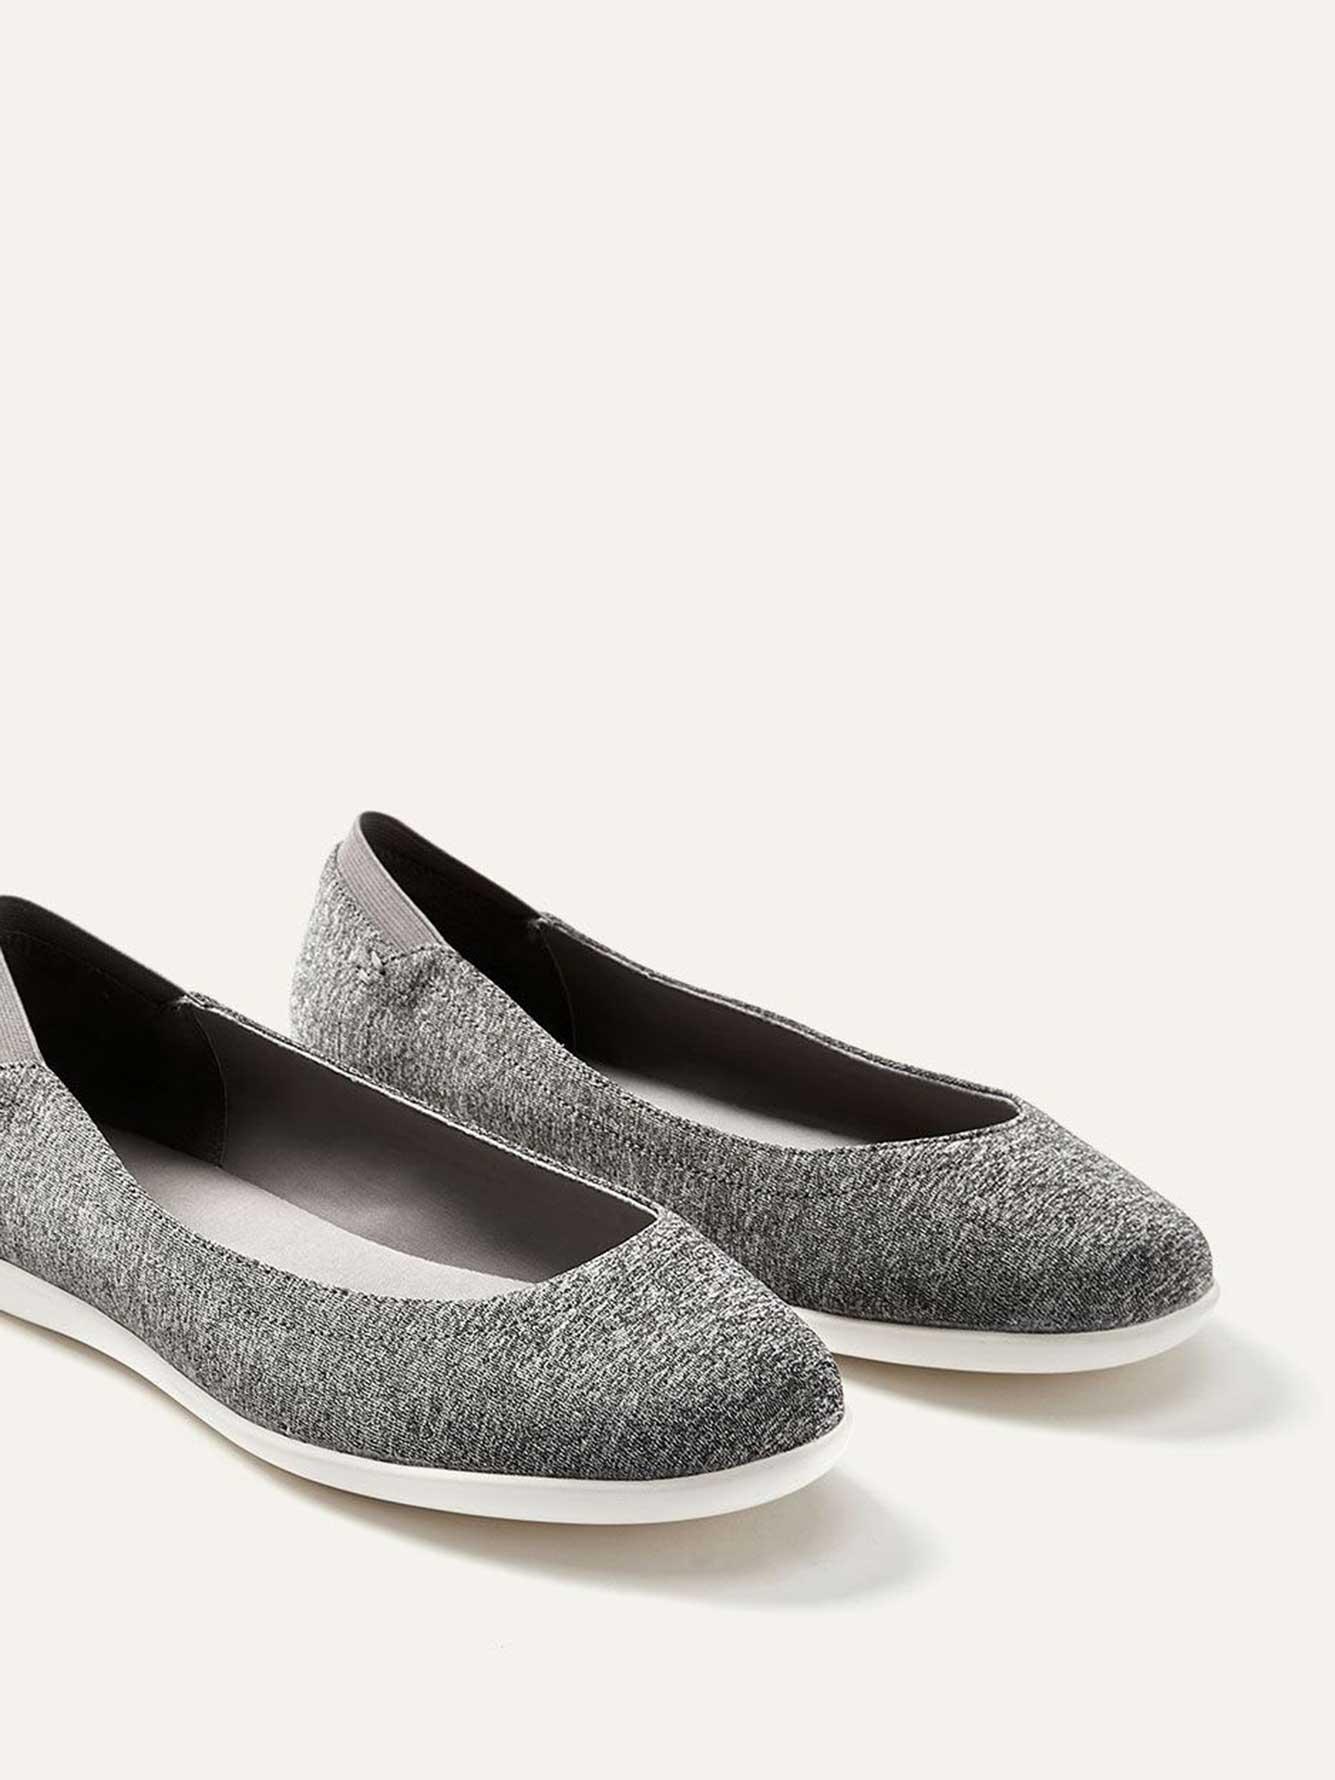 4635f6dfe8baaa Chaussures à enfiler ballerine, pieds extra-larges | Penningtons